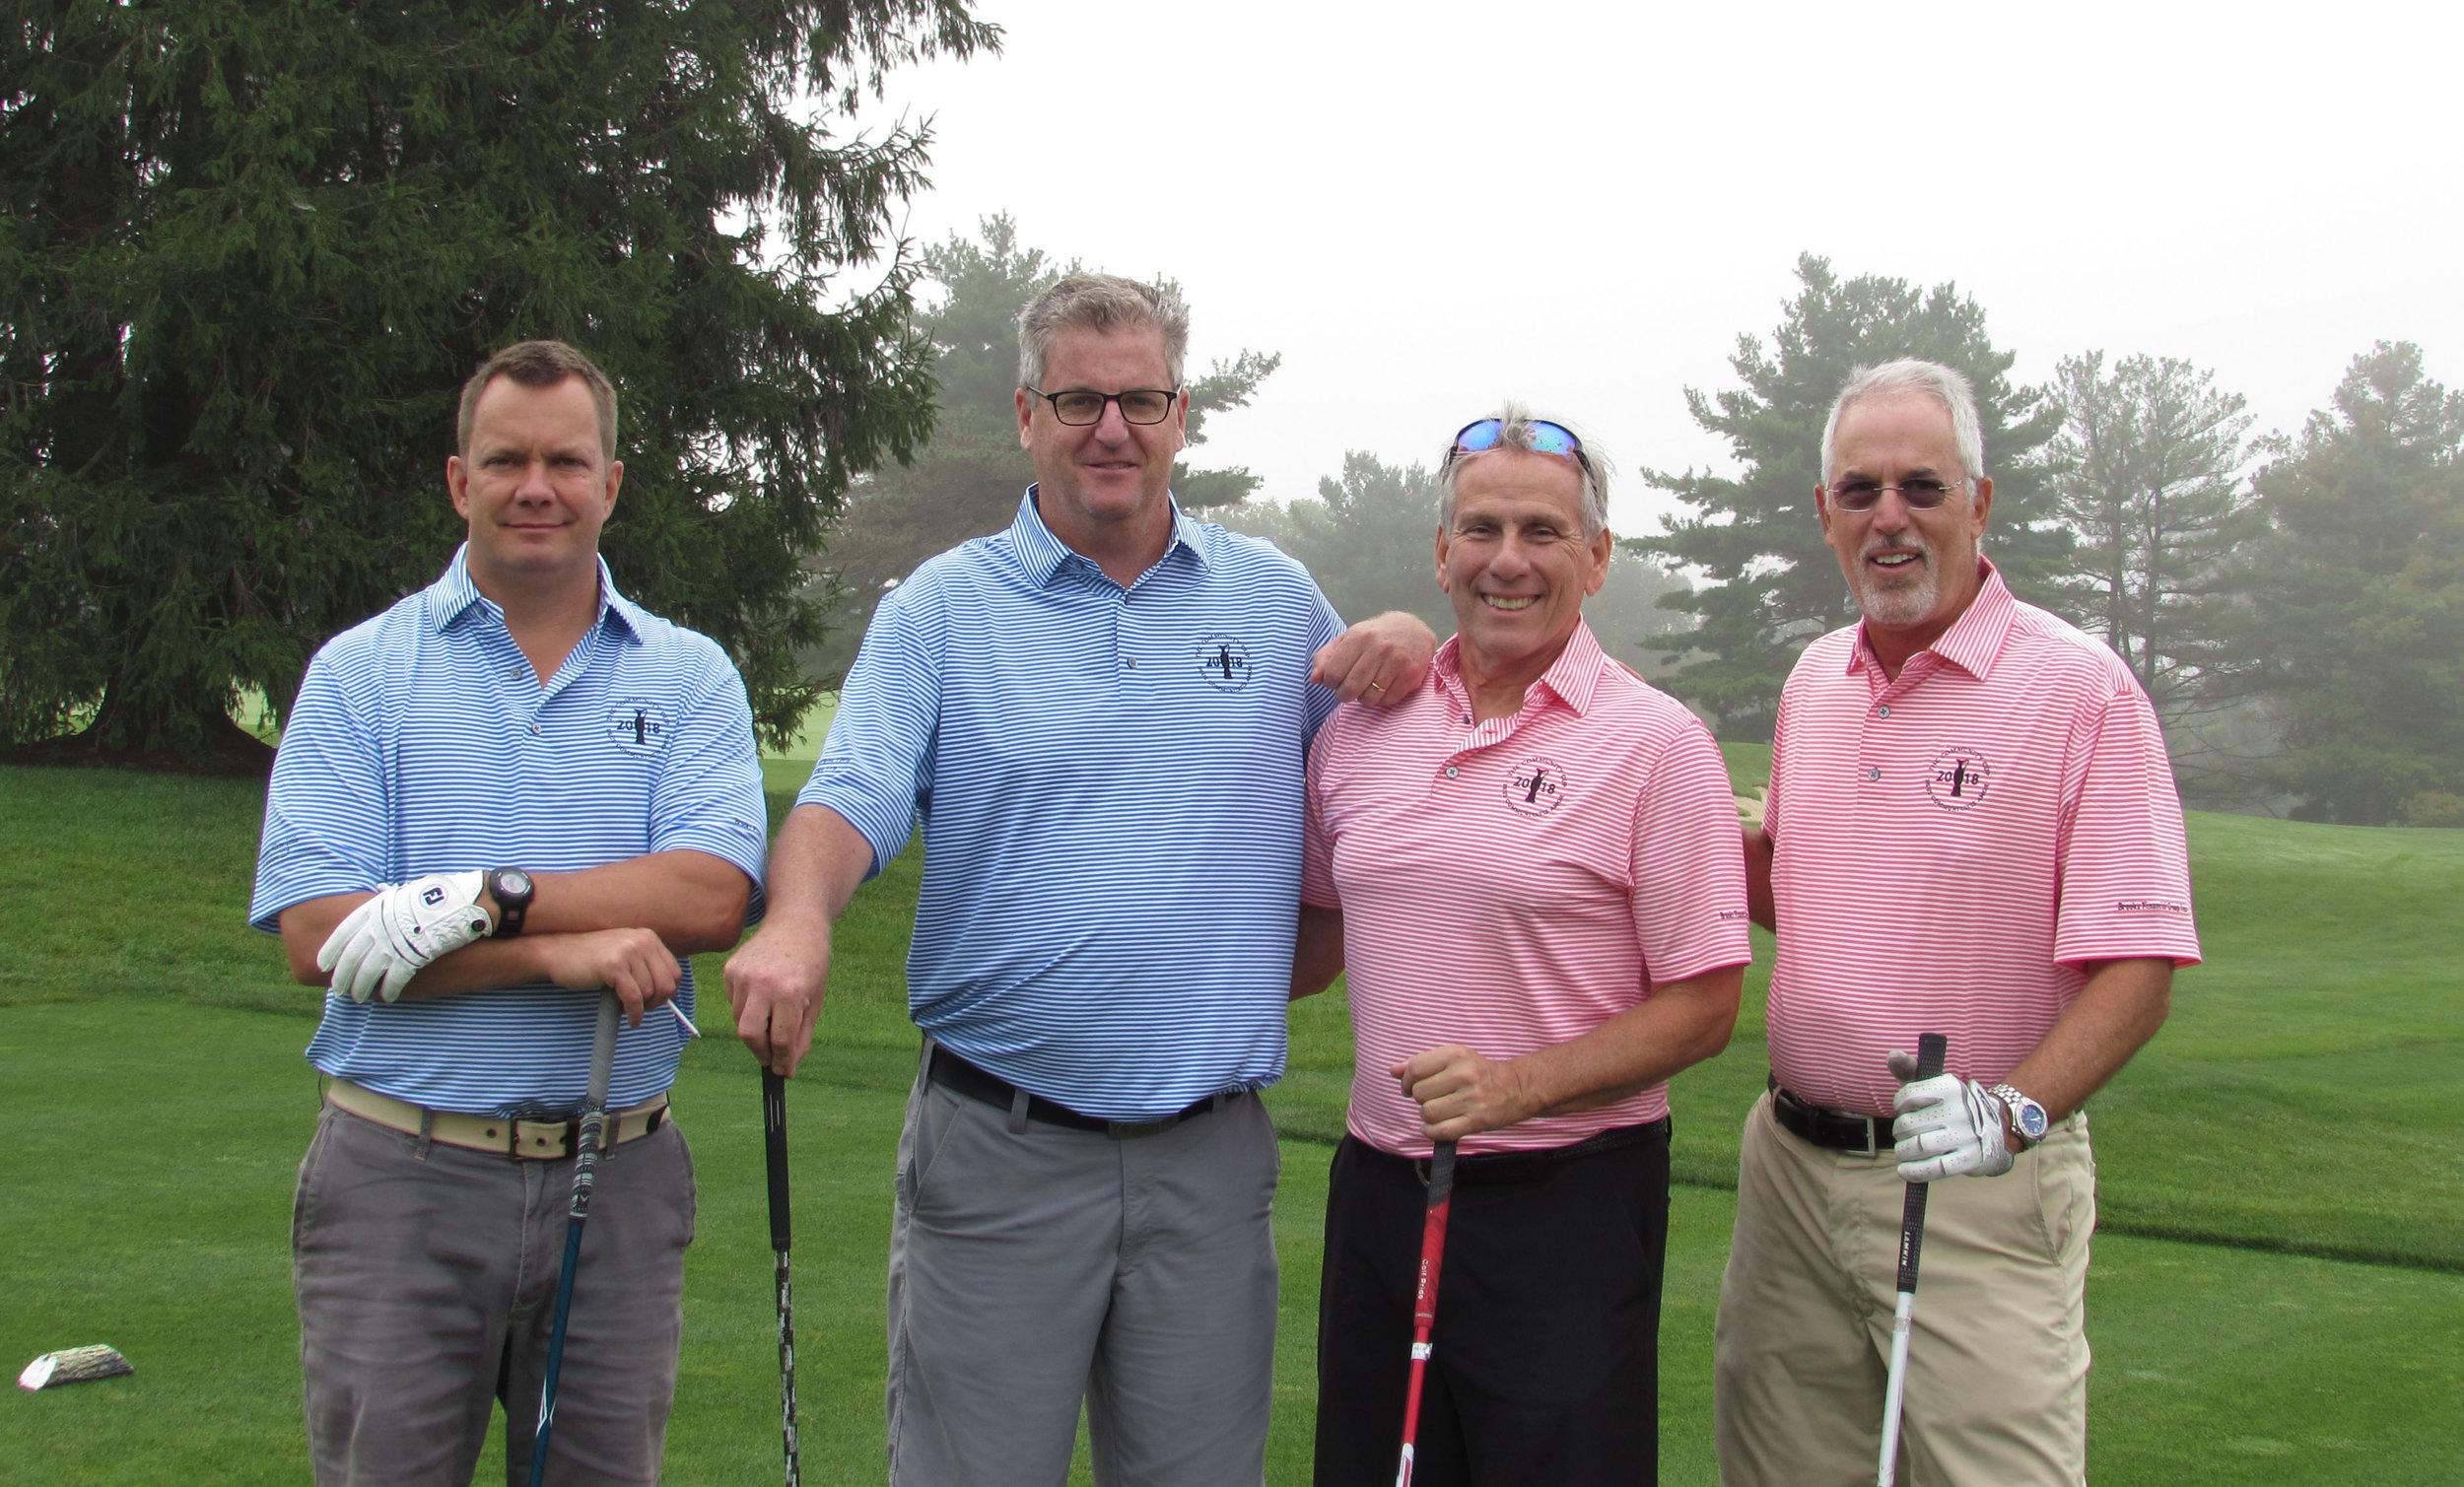 4 More Golfers.jpg